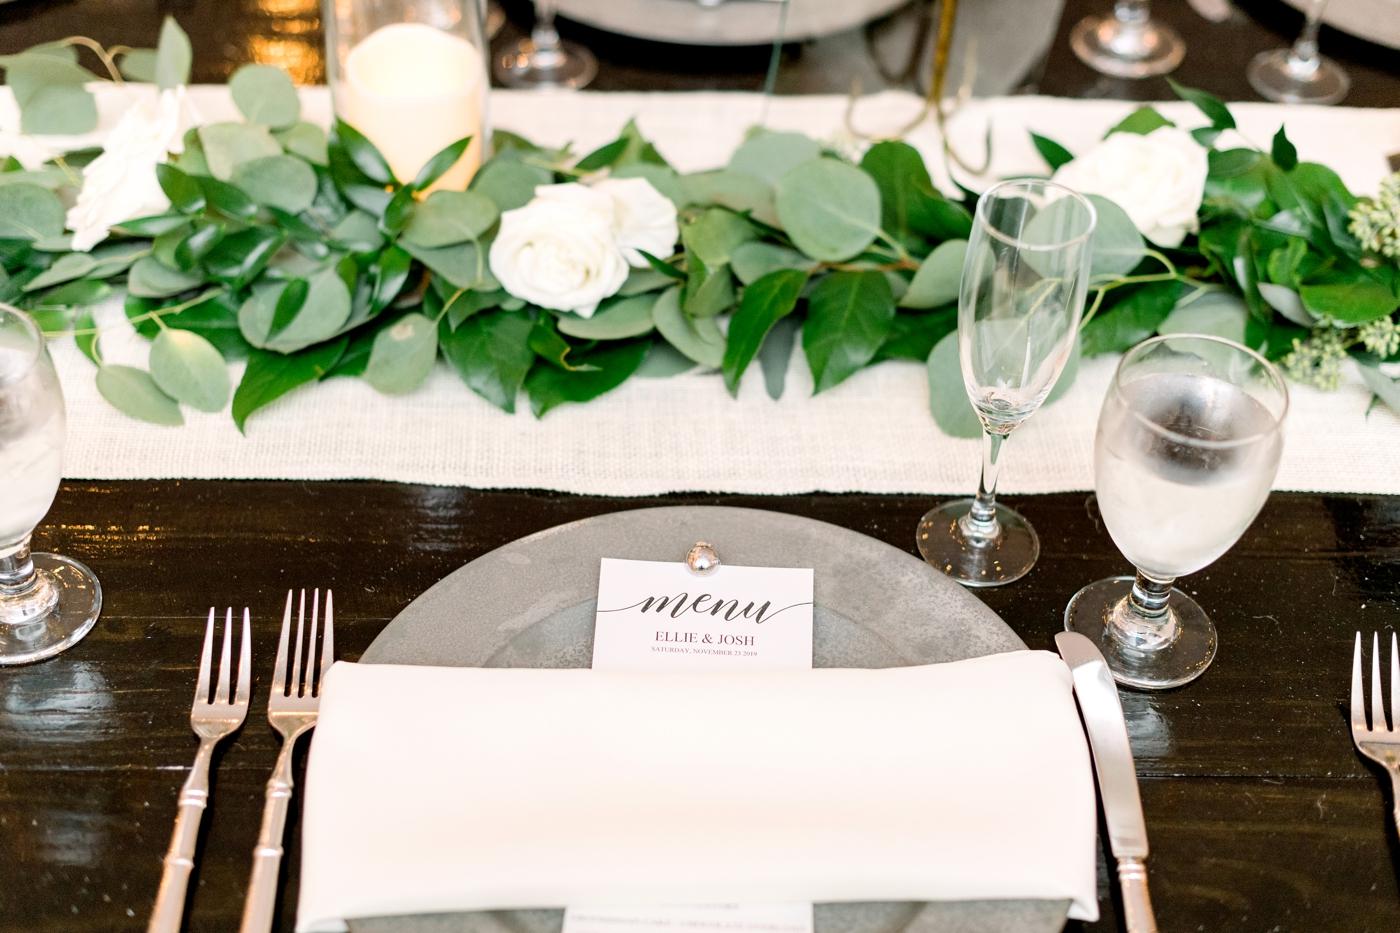 Dinner Menu for Wedding